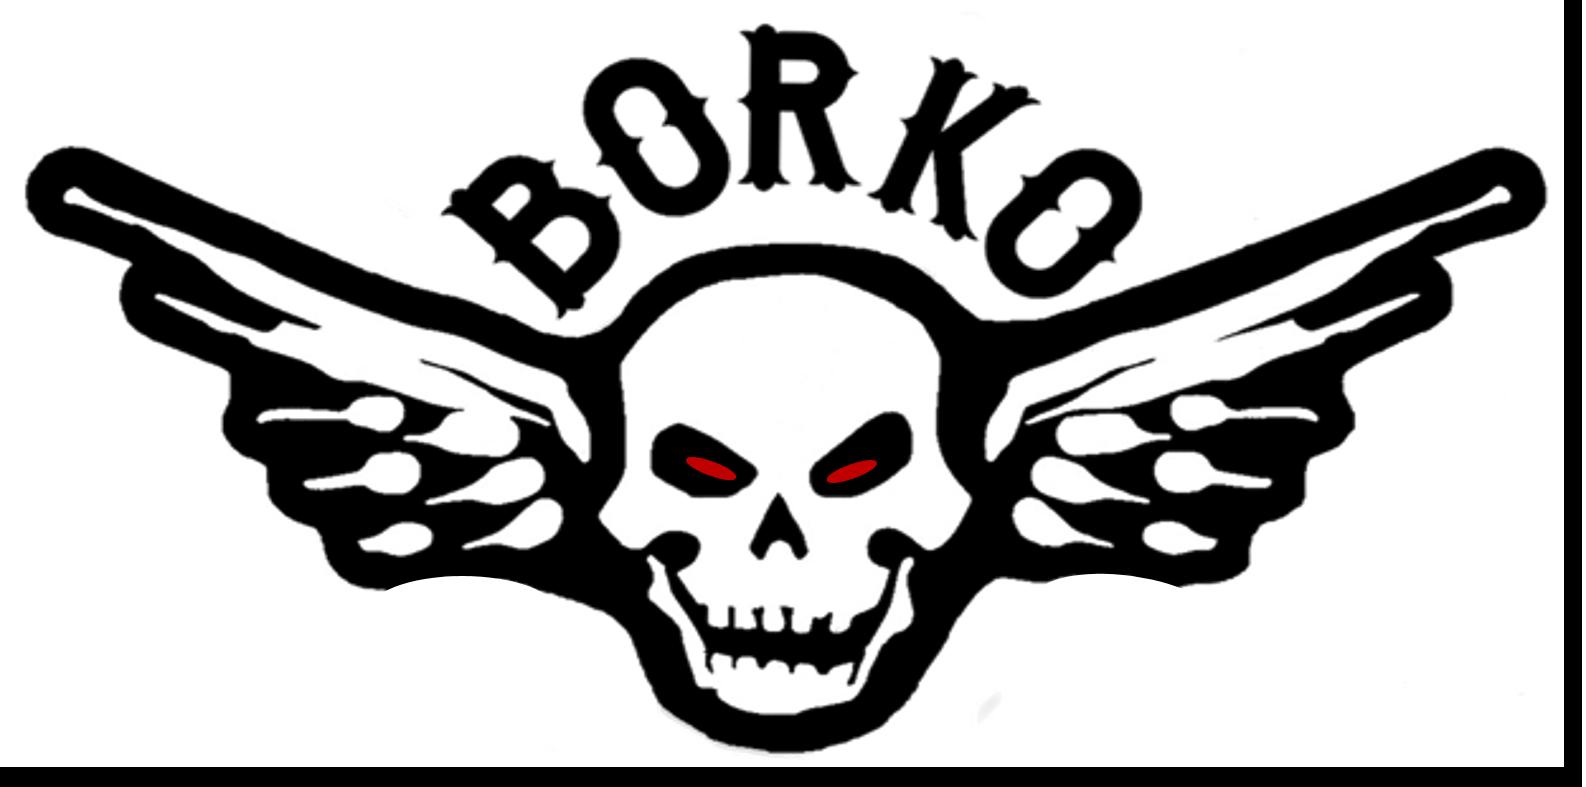 Borko - Skull & Wings v3